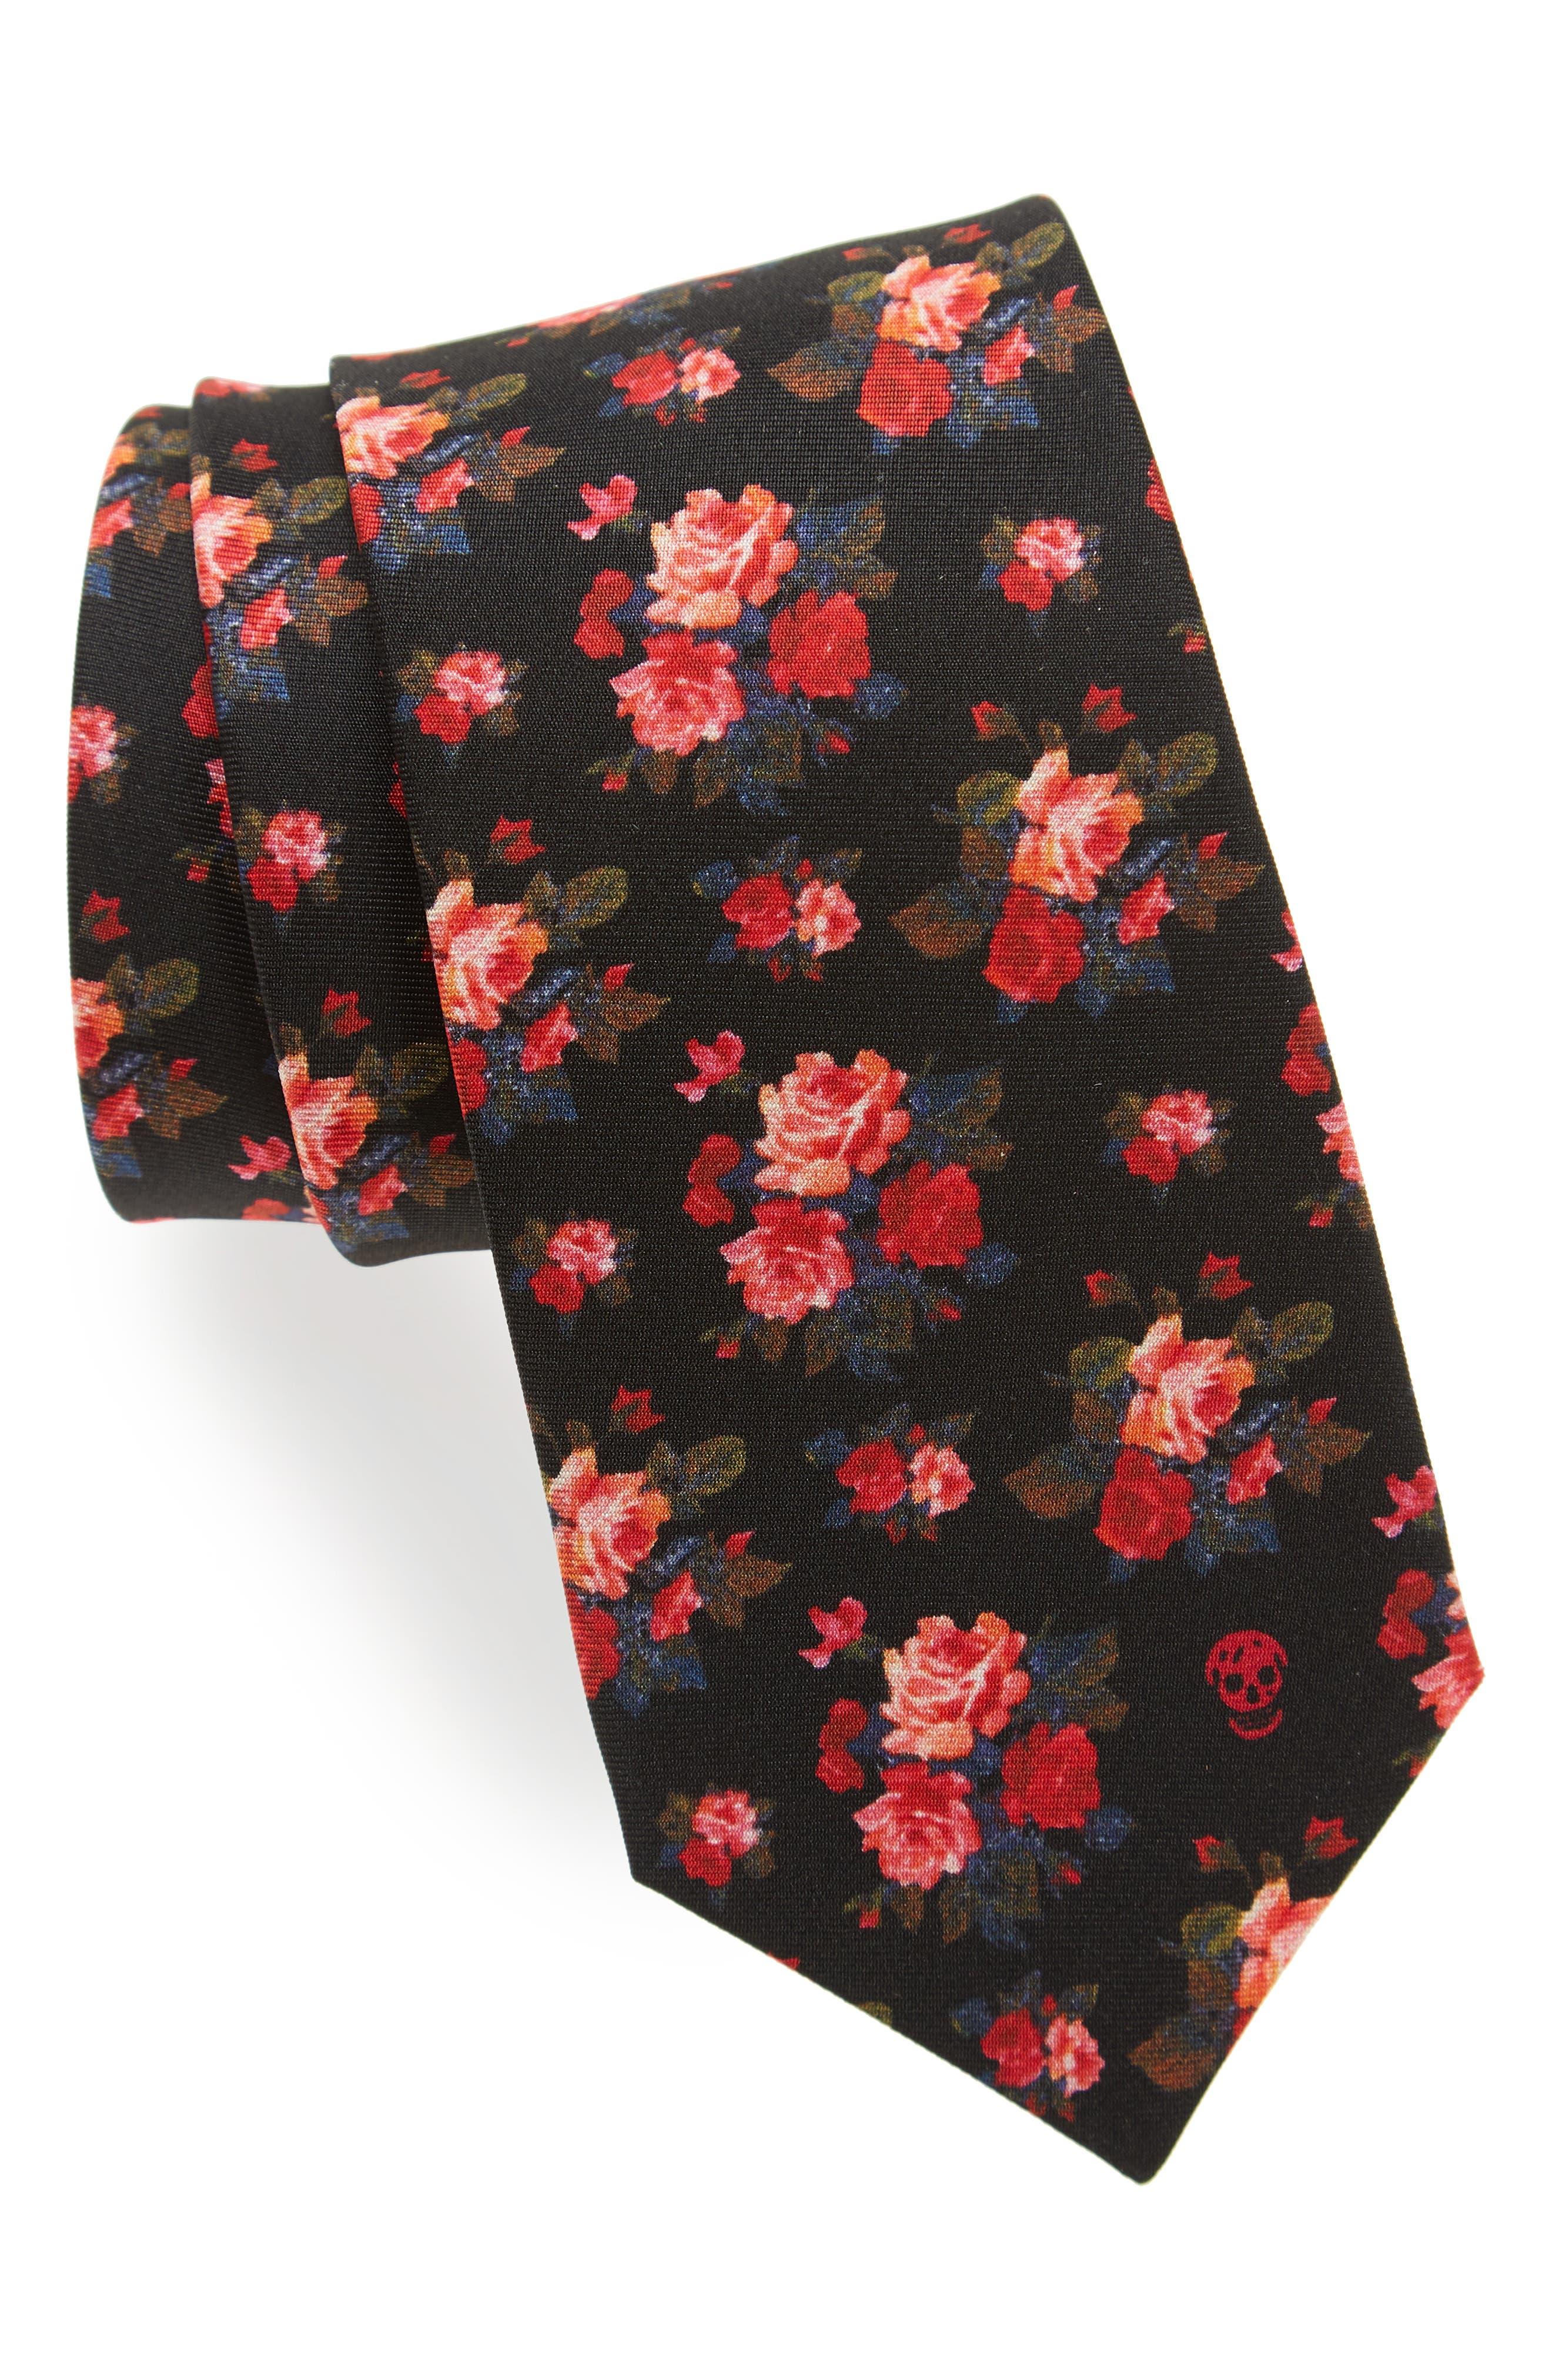 Alexander McQueen Painted Roses Silk Tie